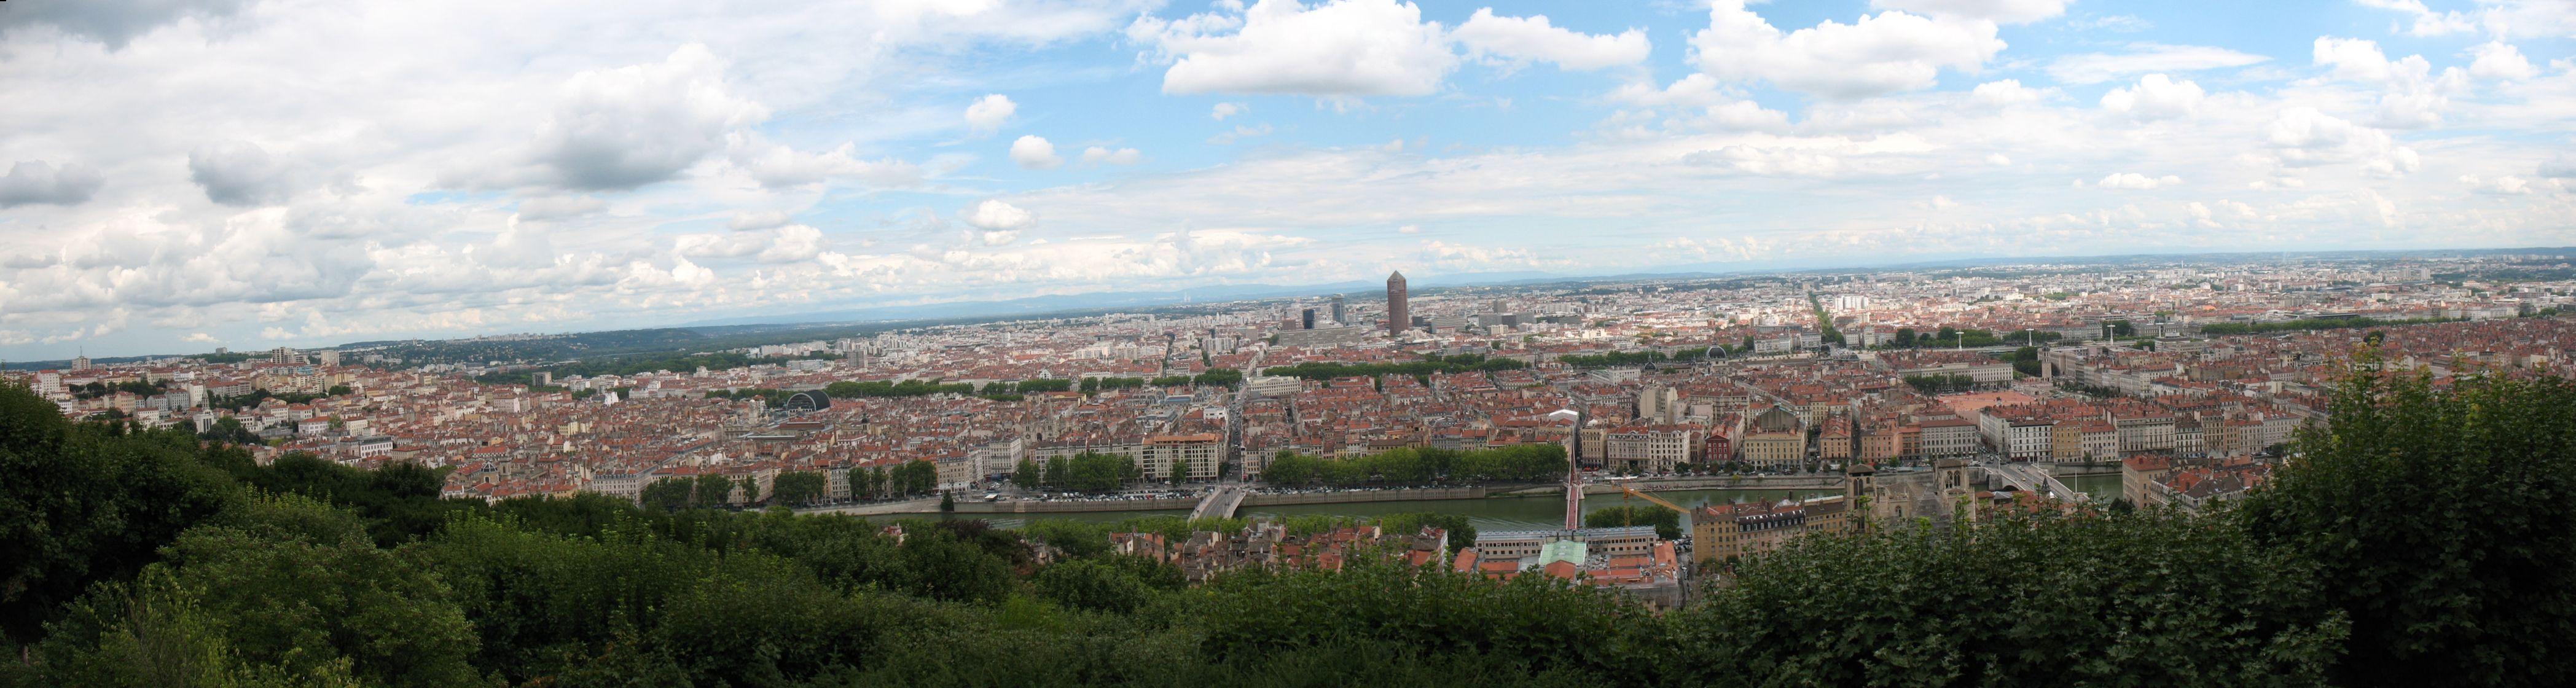 Lyon, France from Fourviere Church hill Church hill